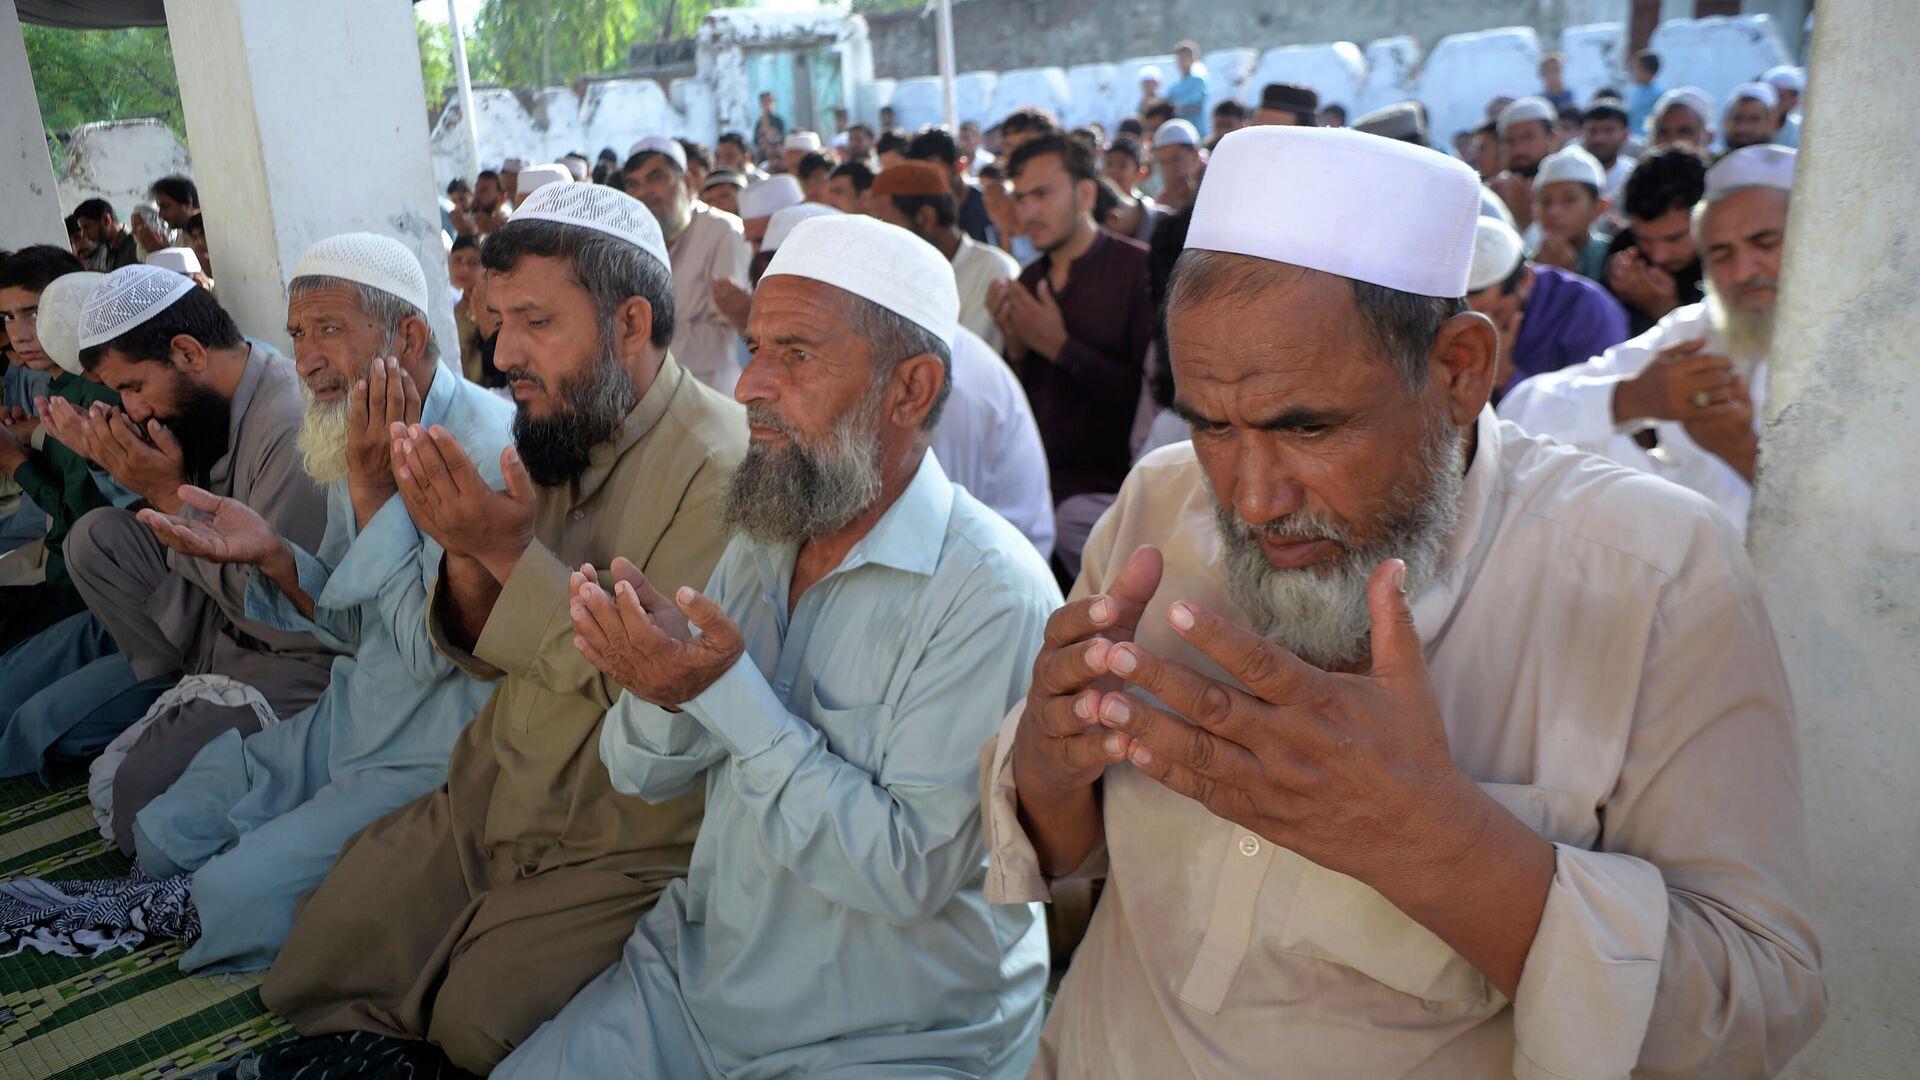 Афганские беженцы совершают молитву Курбан-байрам в мечети в лагере беженцев - Sputnik Таджикистан, 1920, 10.09.2021